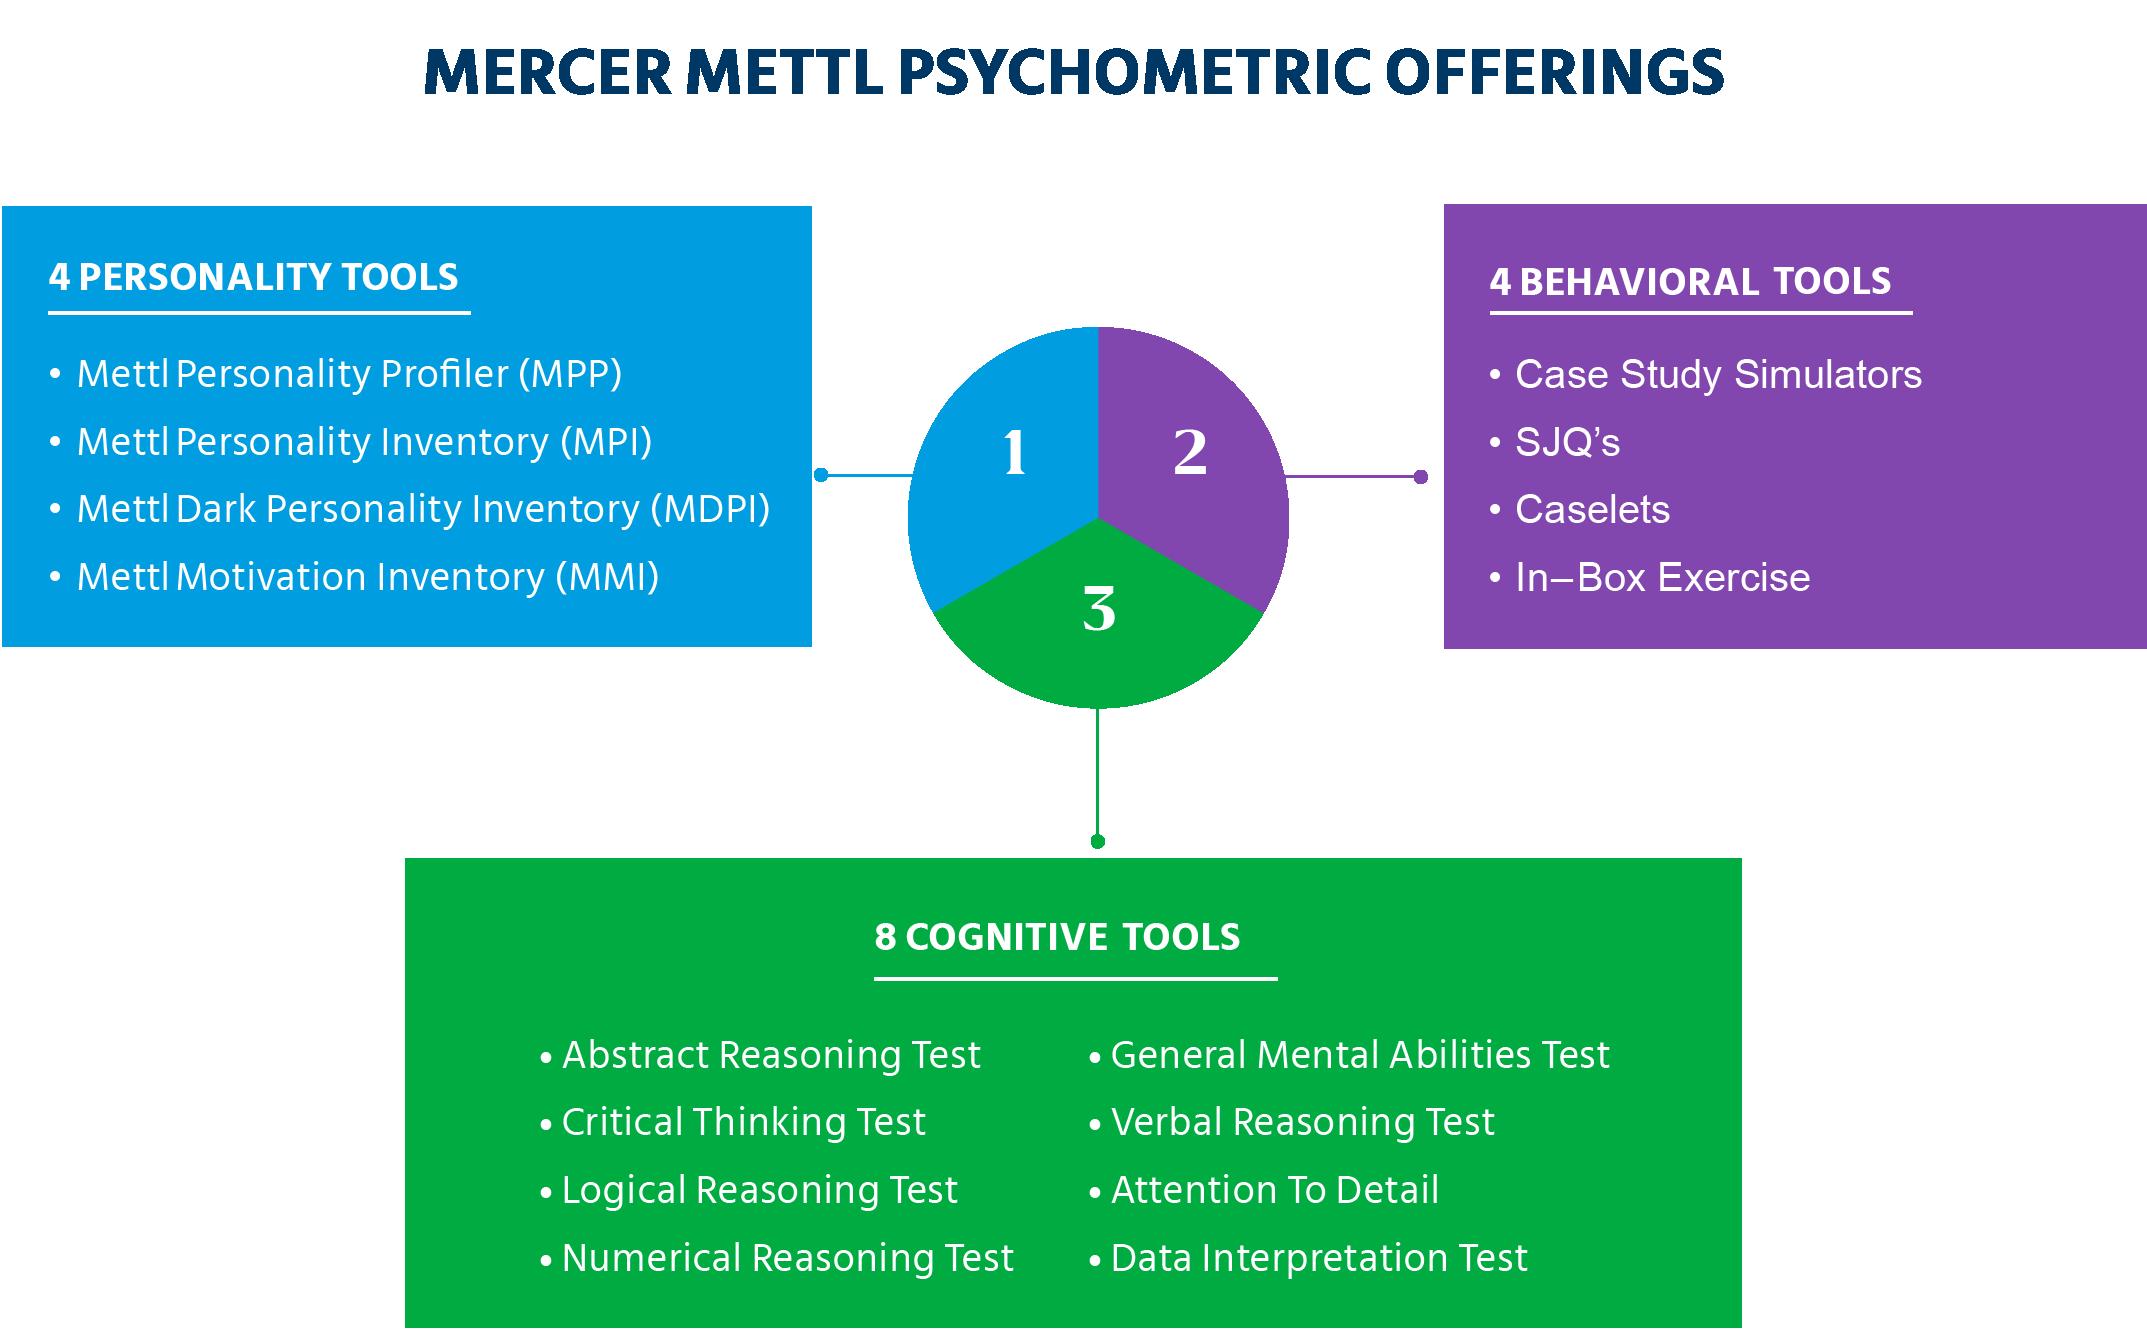 Mercer| Mettl's psychometric offerings